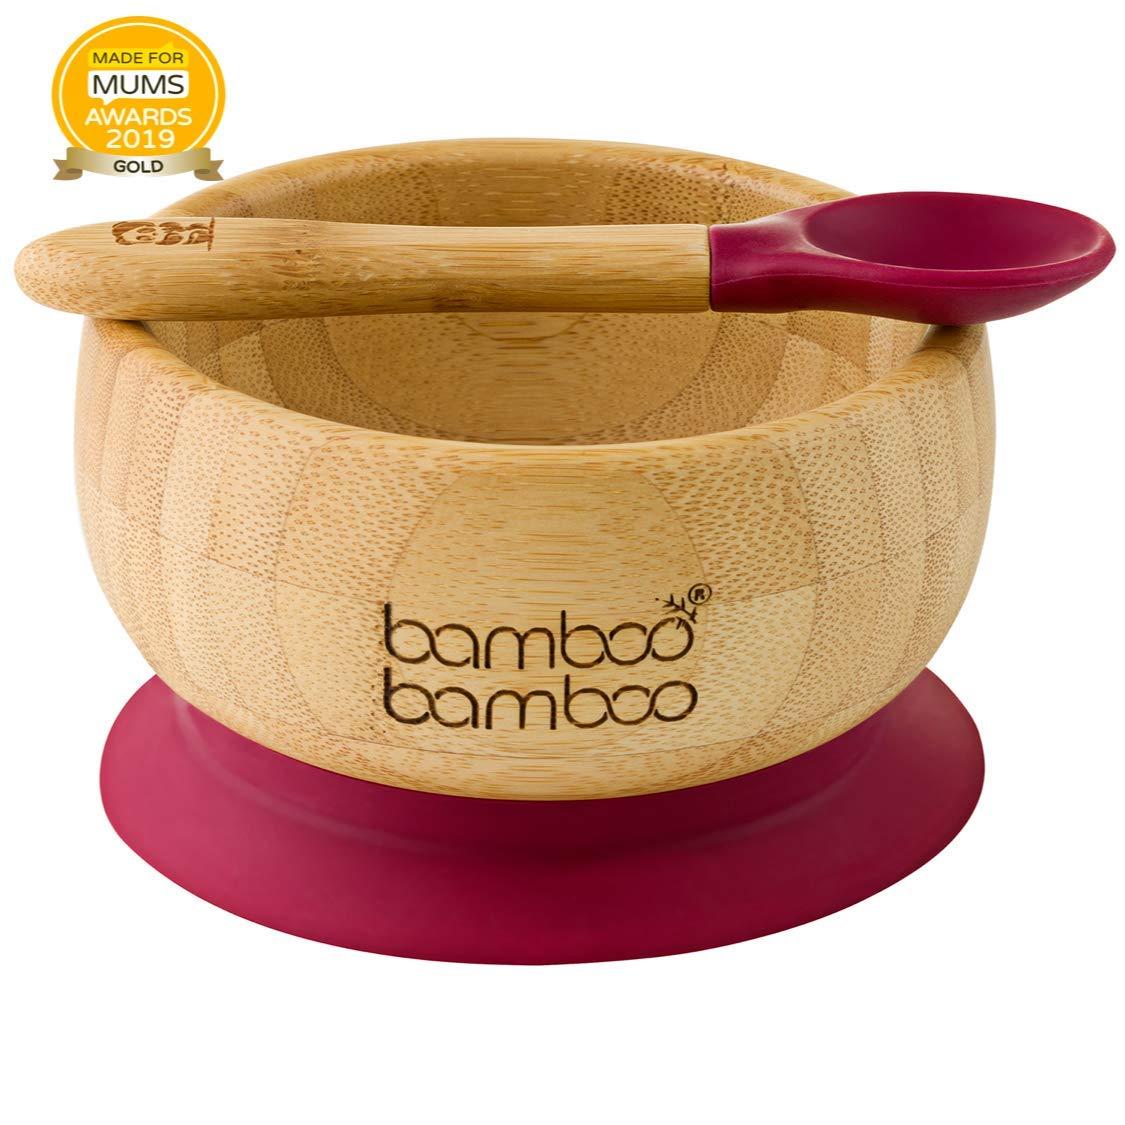 aus naturbelassenem Bambus Standfeste Saug-F/ütter-Sch/üssel Baby Saugnapf-Sch/üssel mit passendem L/öffelset